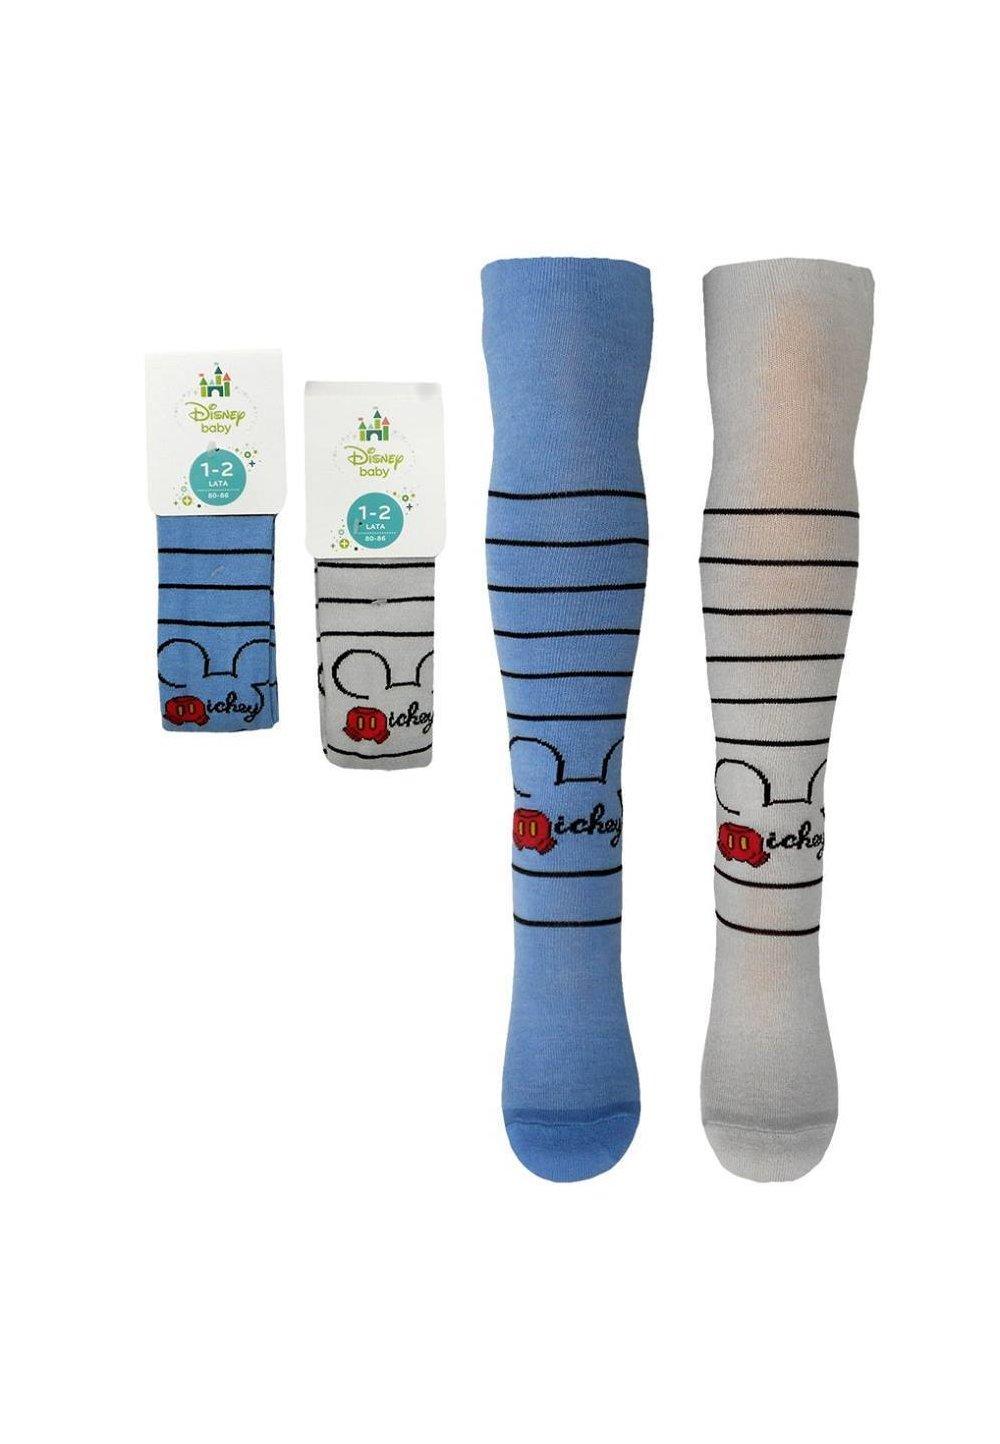 Ciorapi cu chilot, bebe, Mickey Mouse, gri imagine